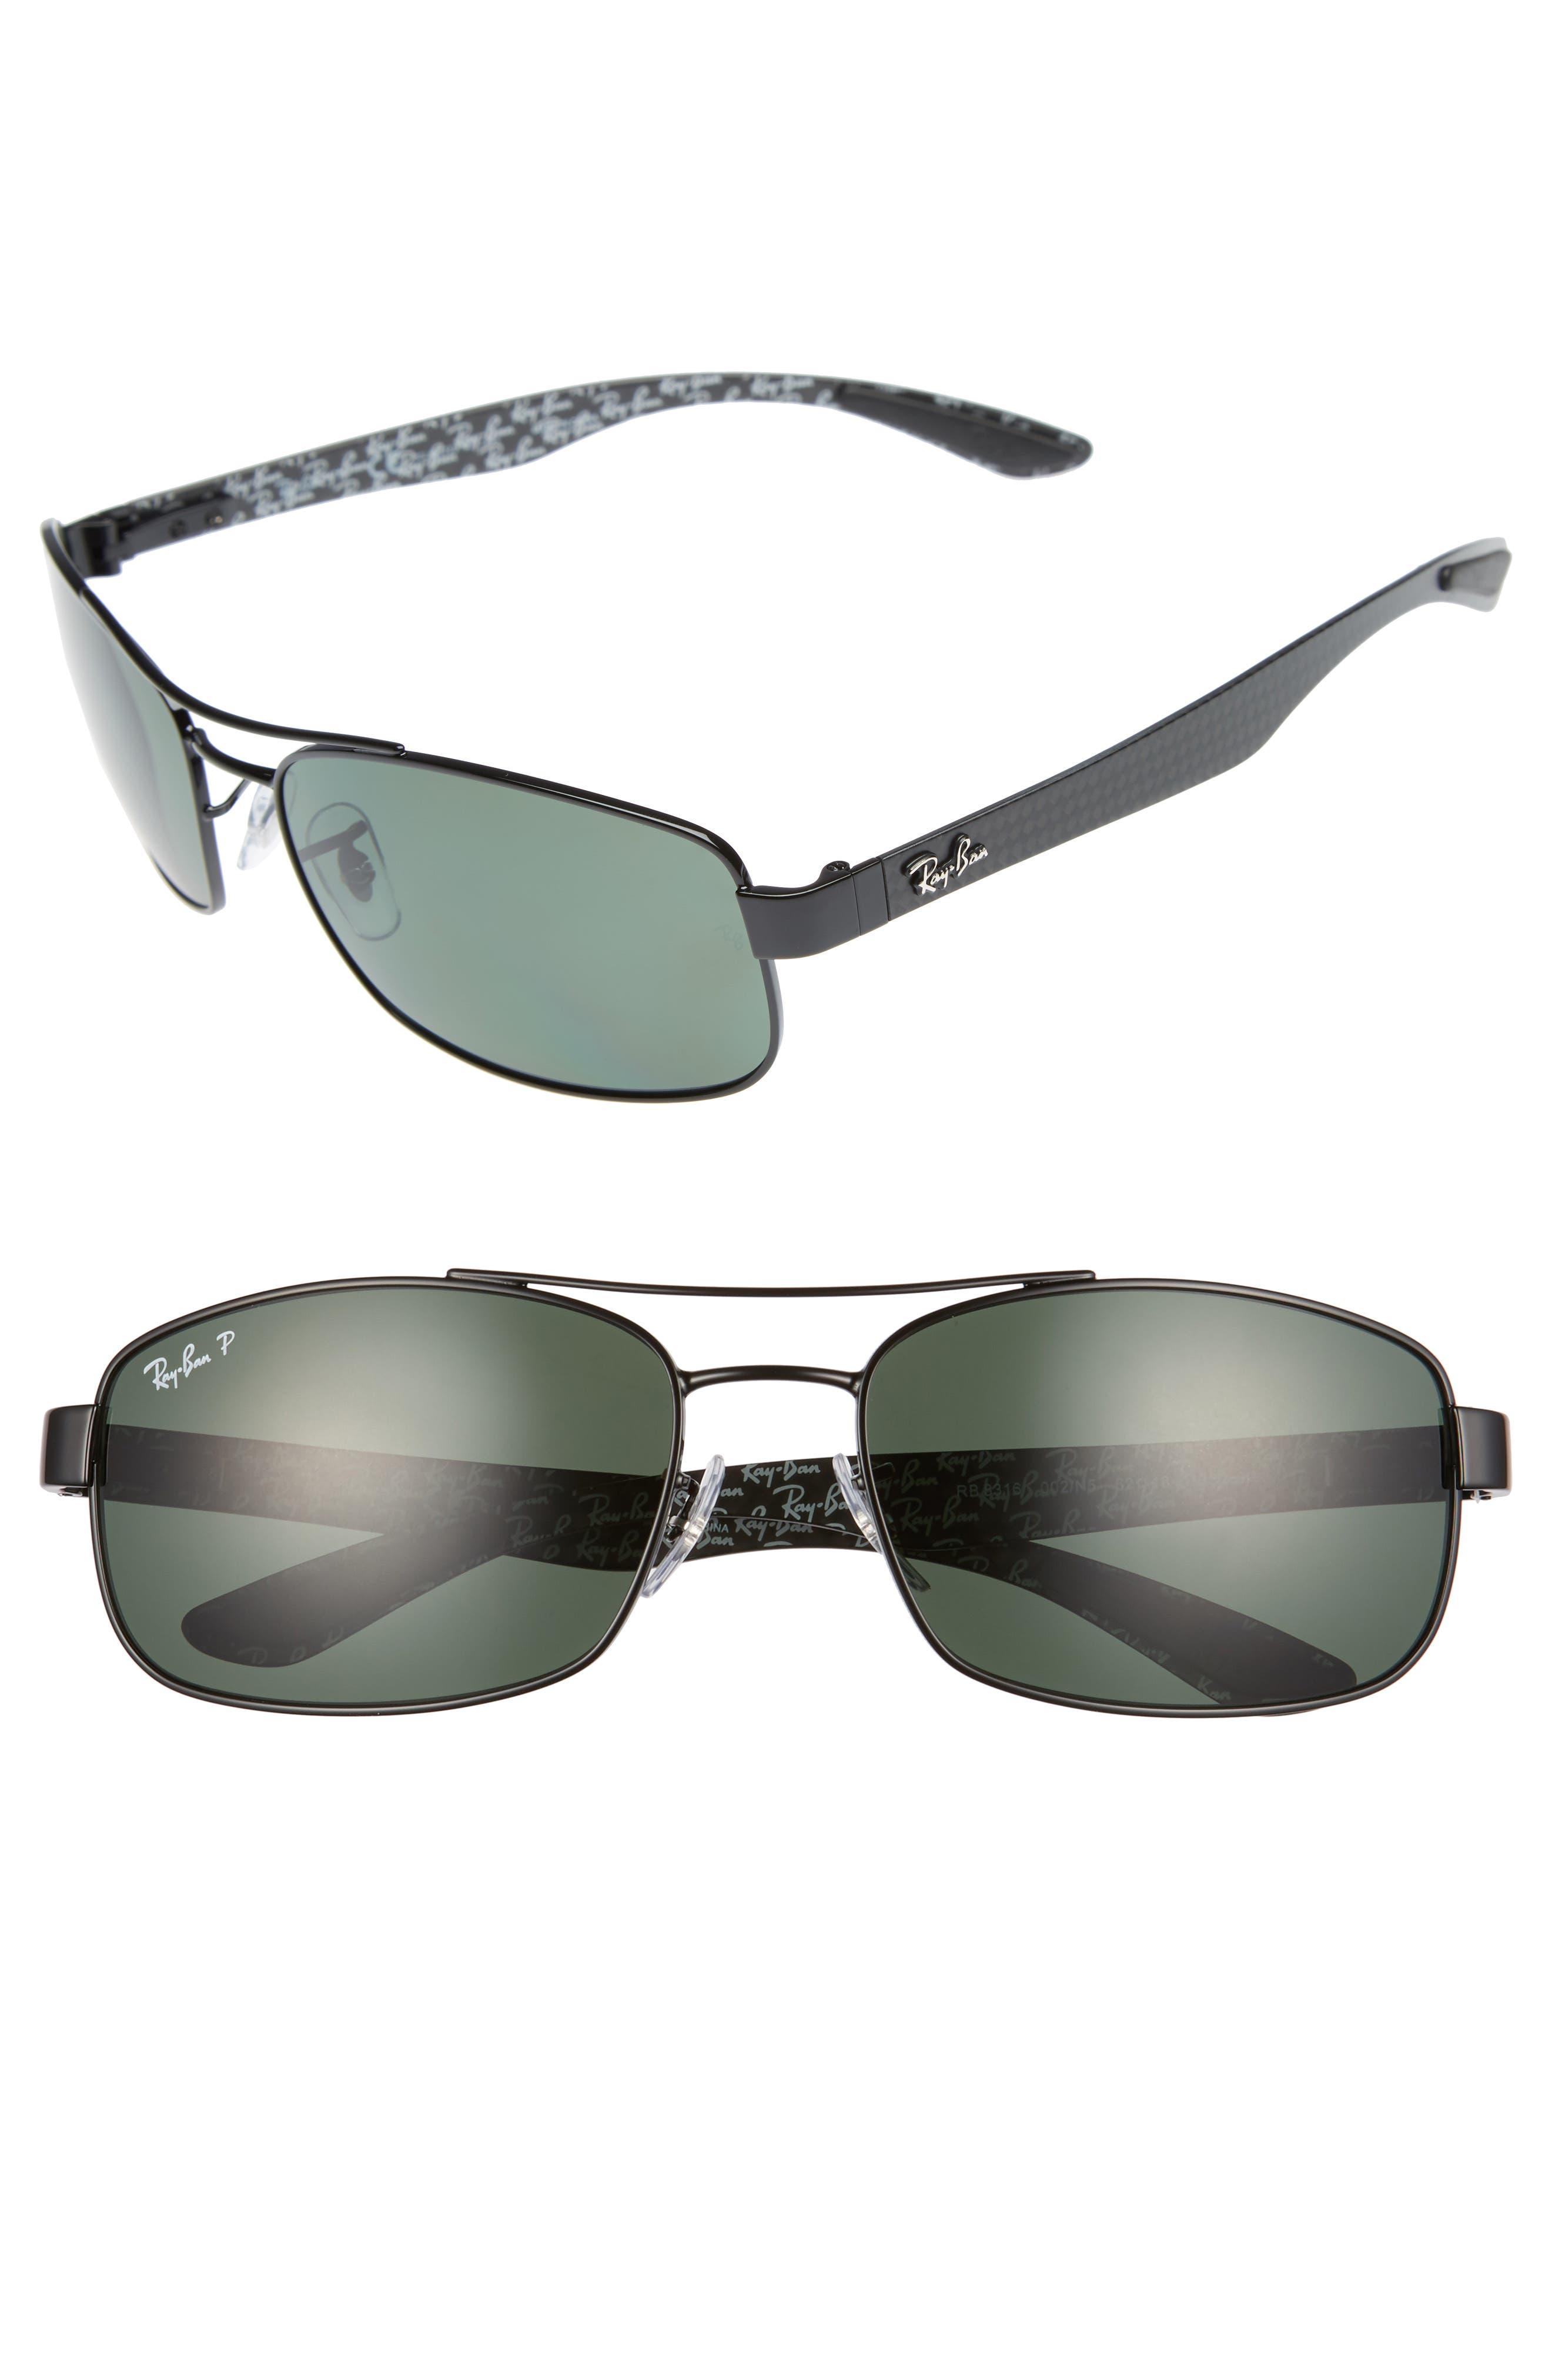 62mm Polarized Sunglasses,                         Main,                         color, BLACK/ GREEN P